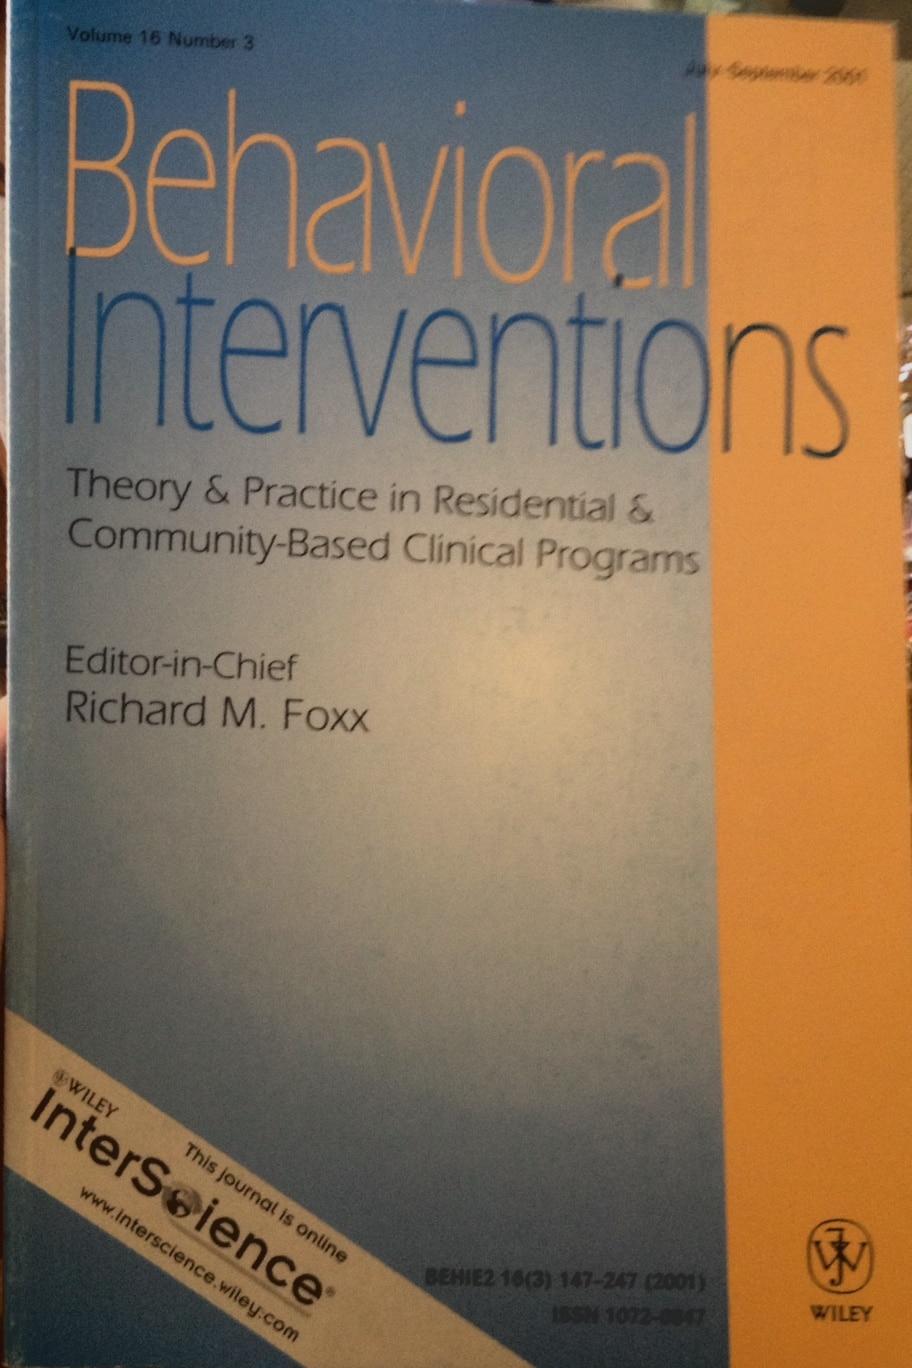 Behavioral Interventions Vol  16, N°3 Lug-sett 2001